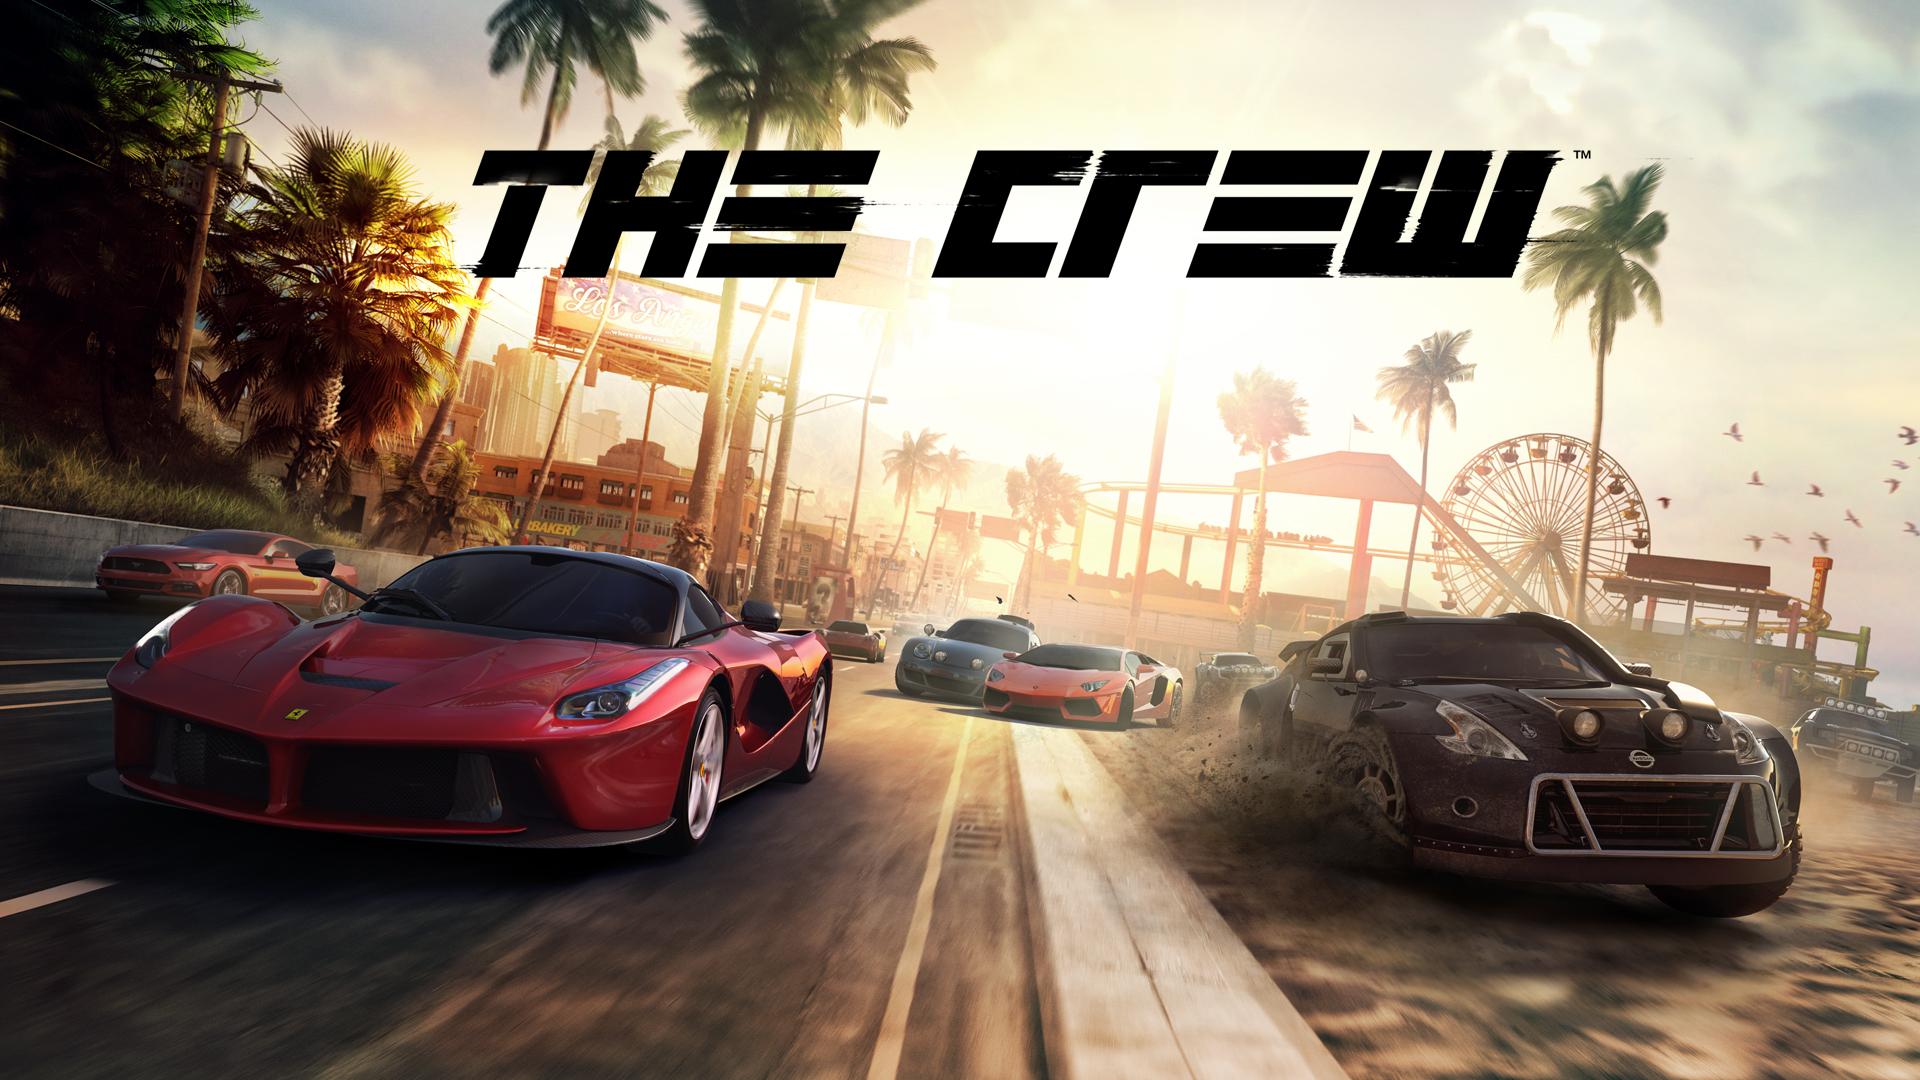 [Uplay] The Crew ab heute gratis (Ubisoft 30 Jahre)